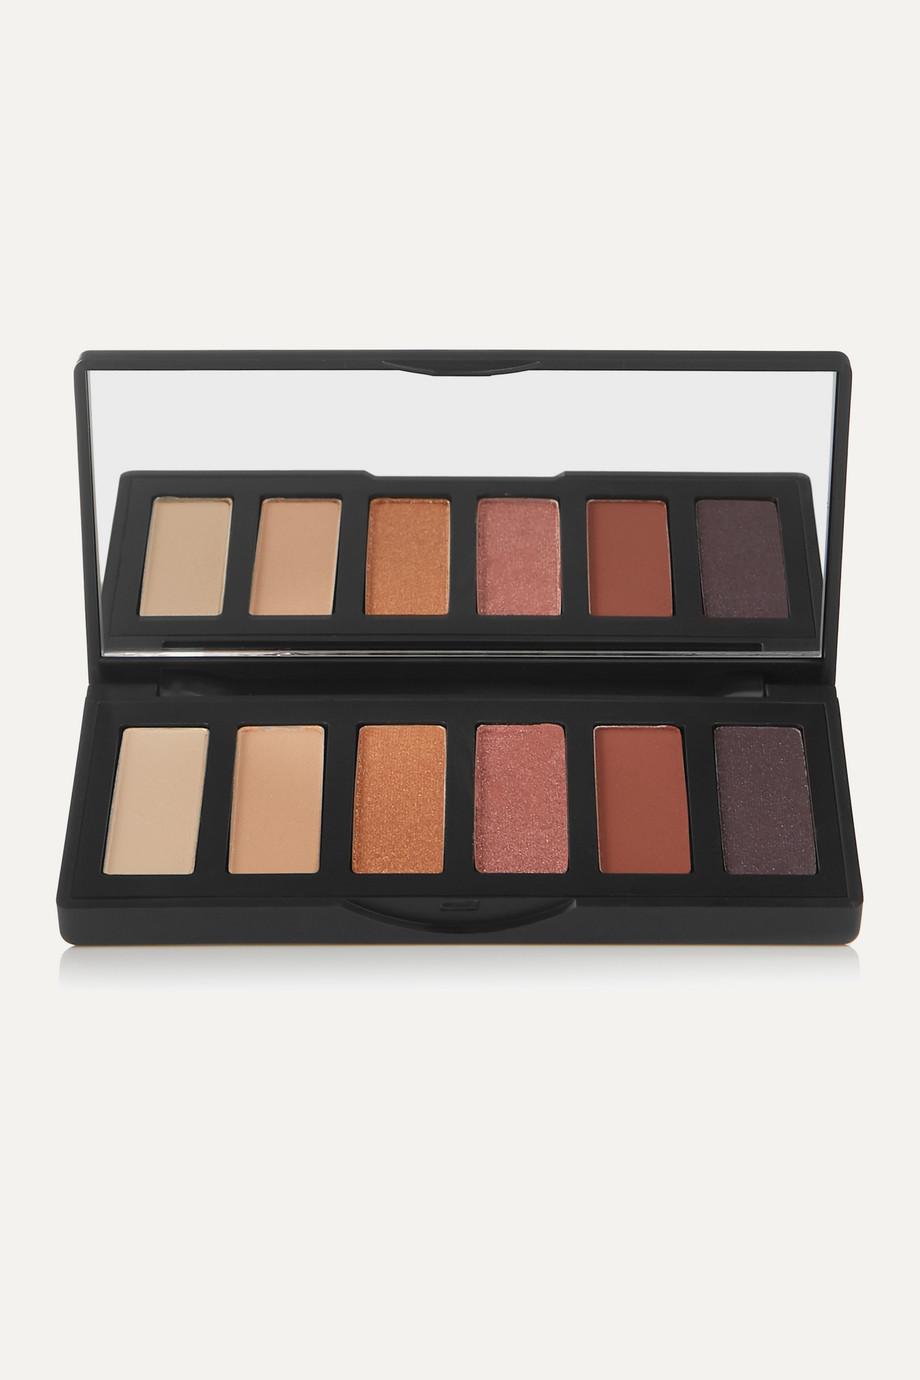 Code8 Iconoclast Eyeshadow Palette - Burnt Sienna